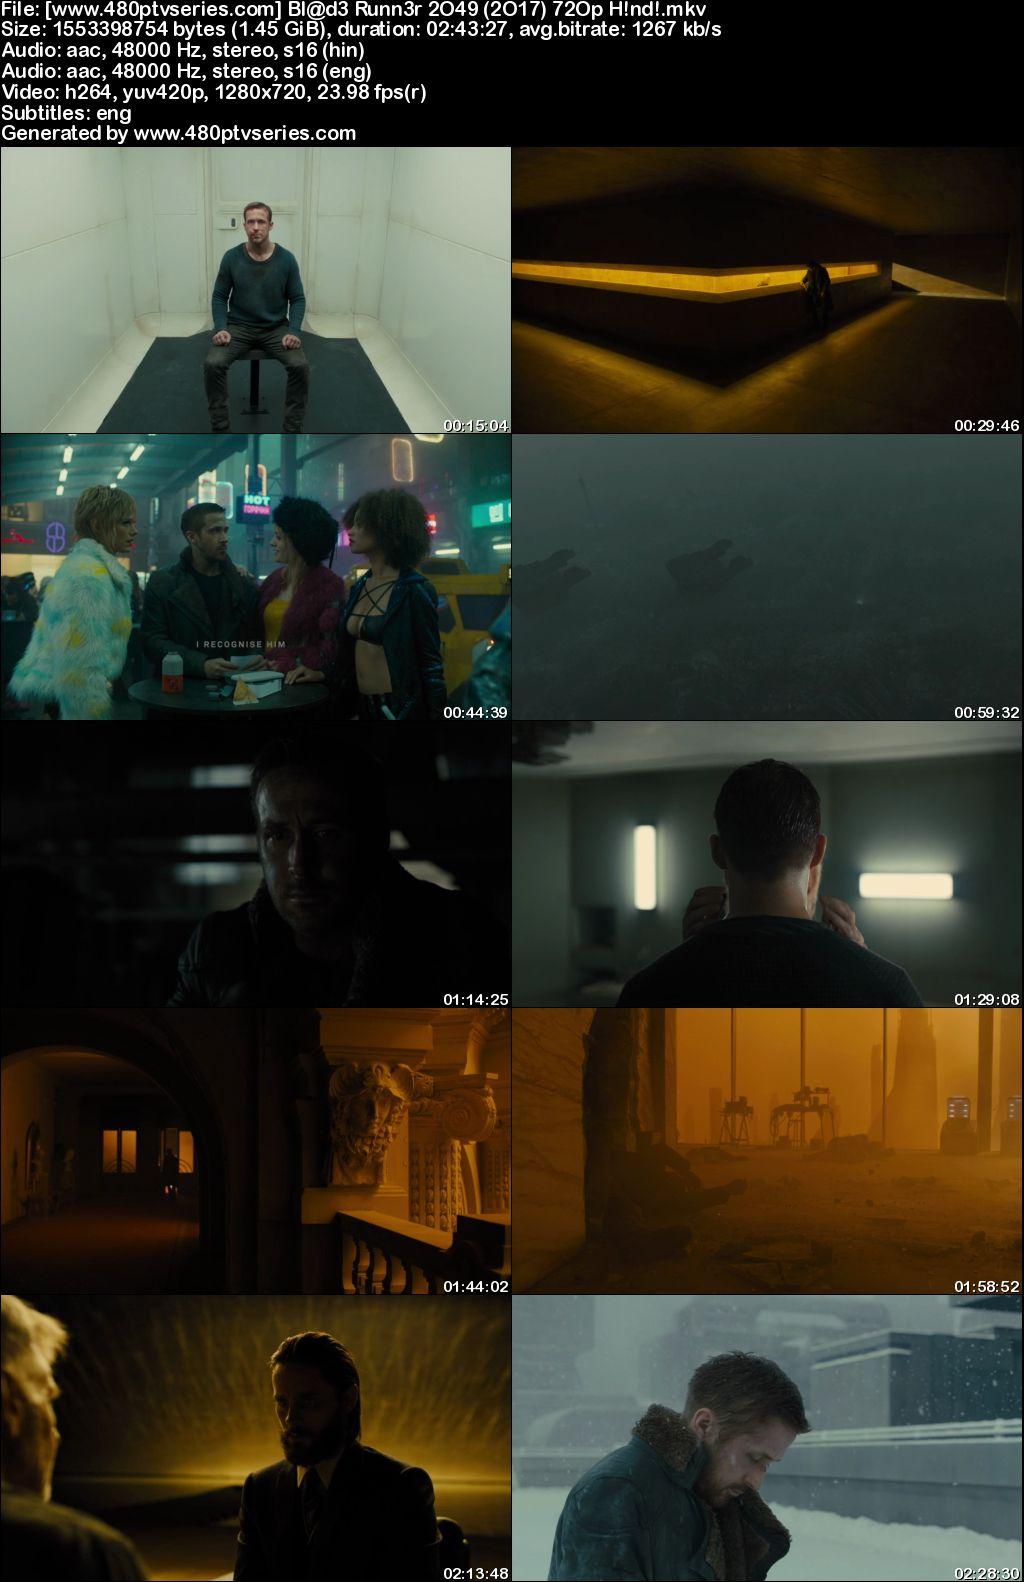 Download Blade Runner 2049 (2017) Full Hindi Dual Audio Movie Download 720p Bluray Free Watch Online Full Movie Download Worldfree4u 9xmovies